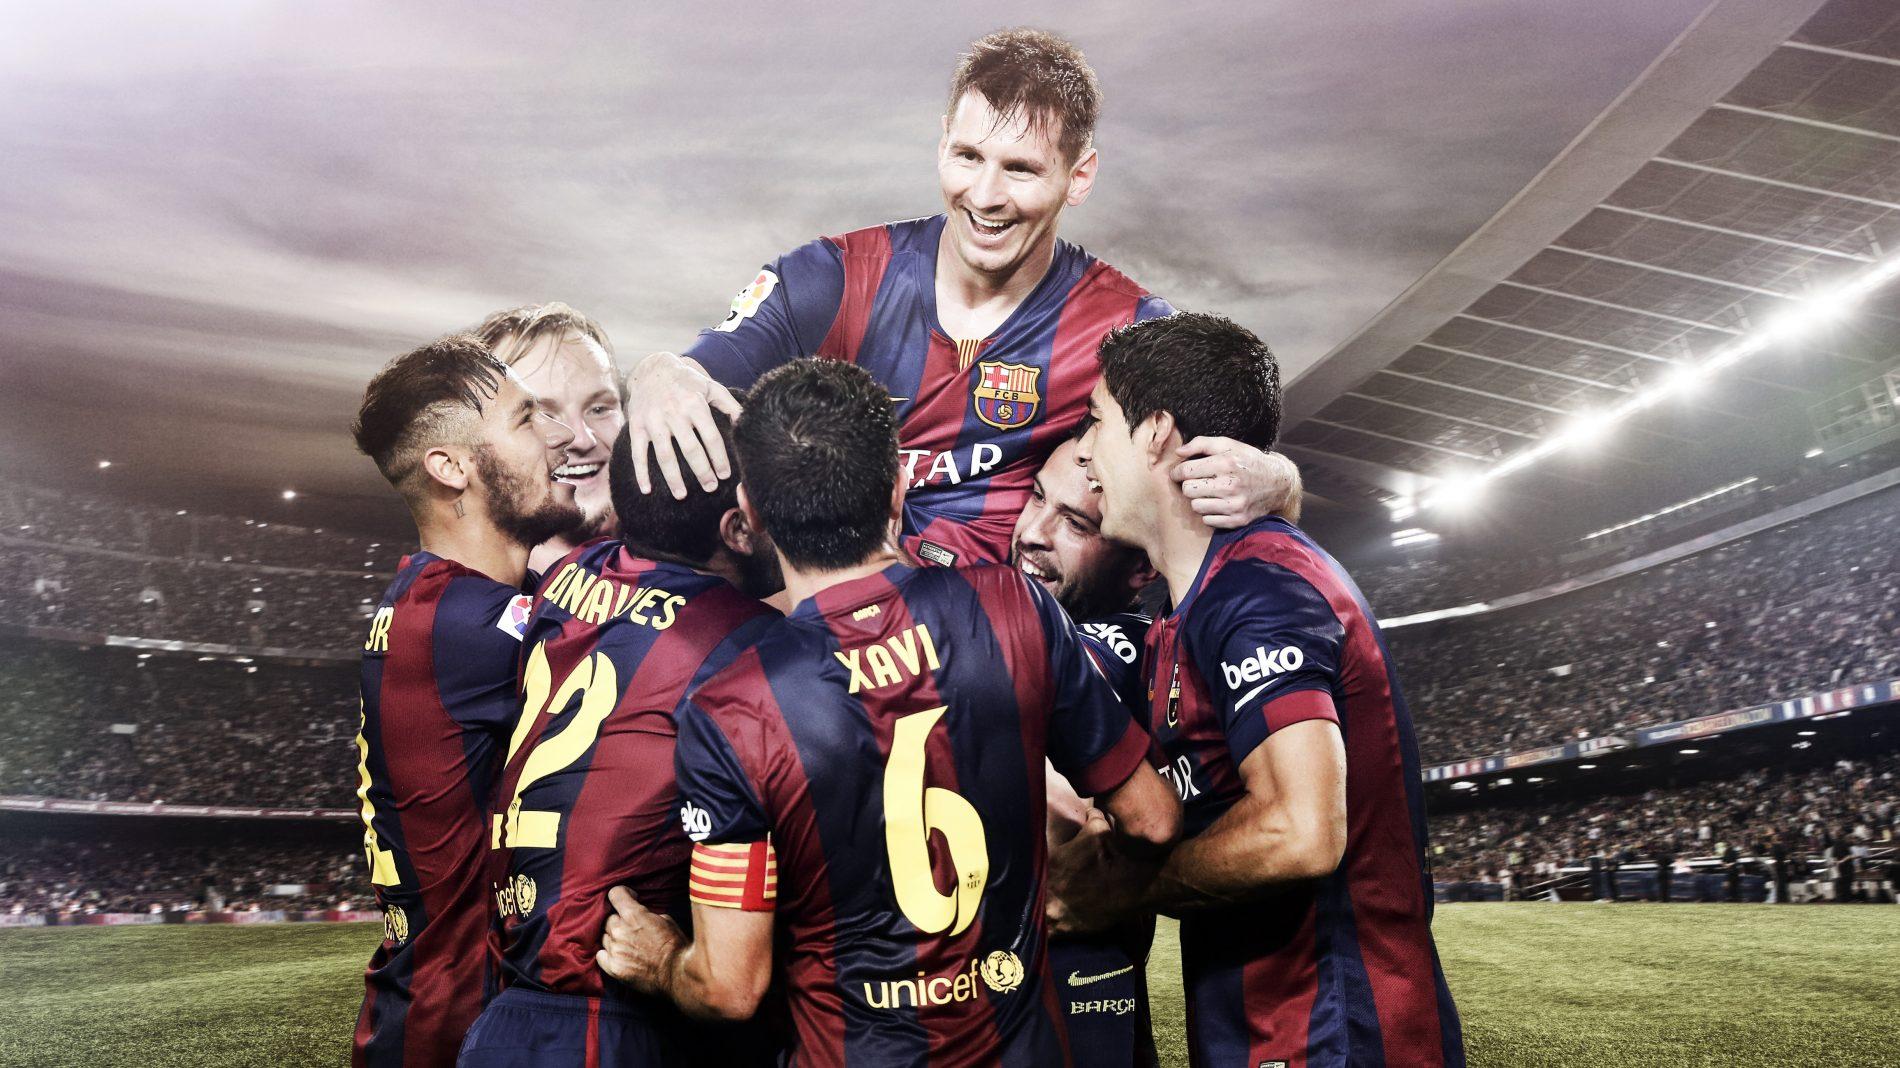 Beko met en scène les joueurs du FC Barcelona #JoinOurTeam